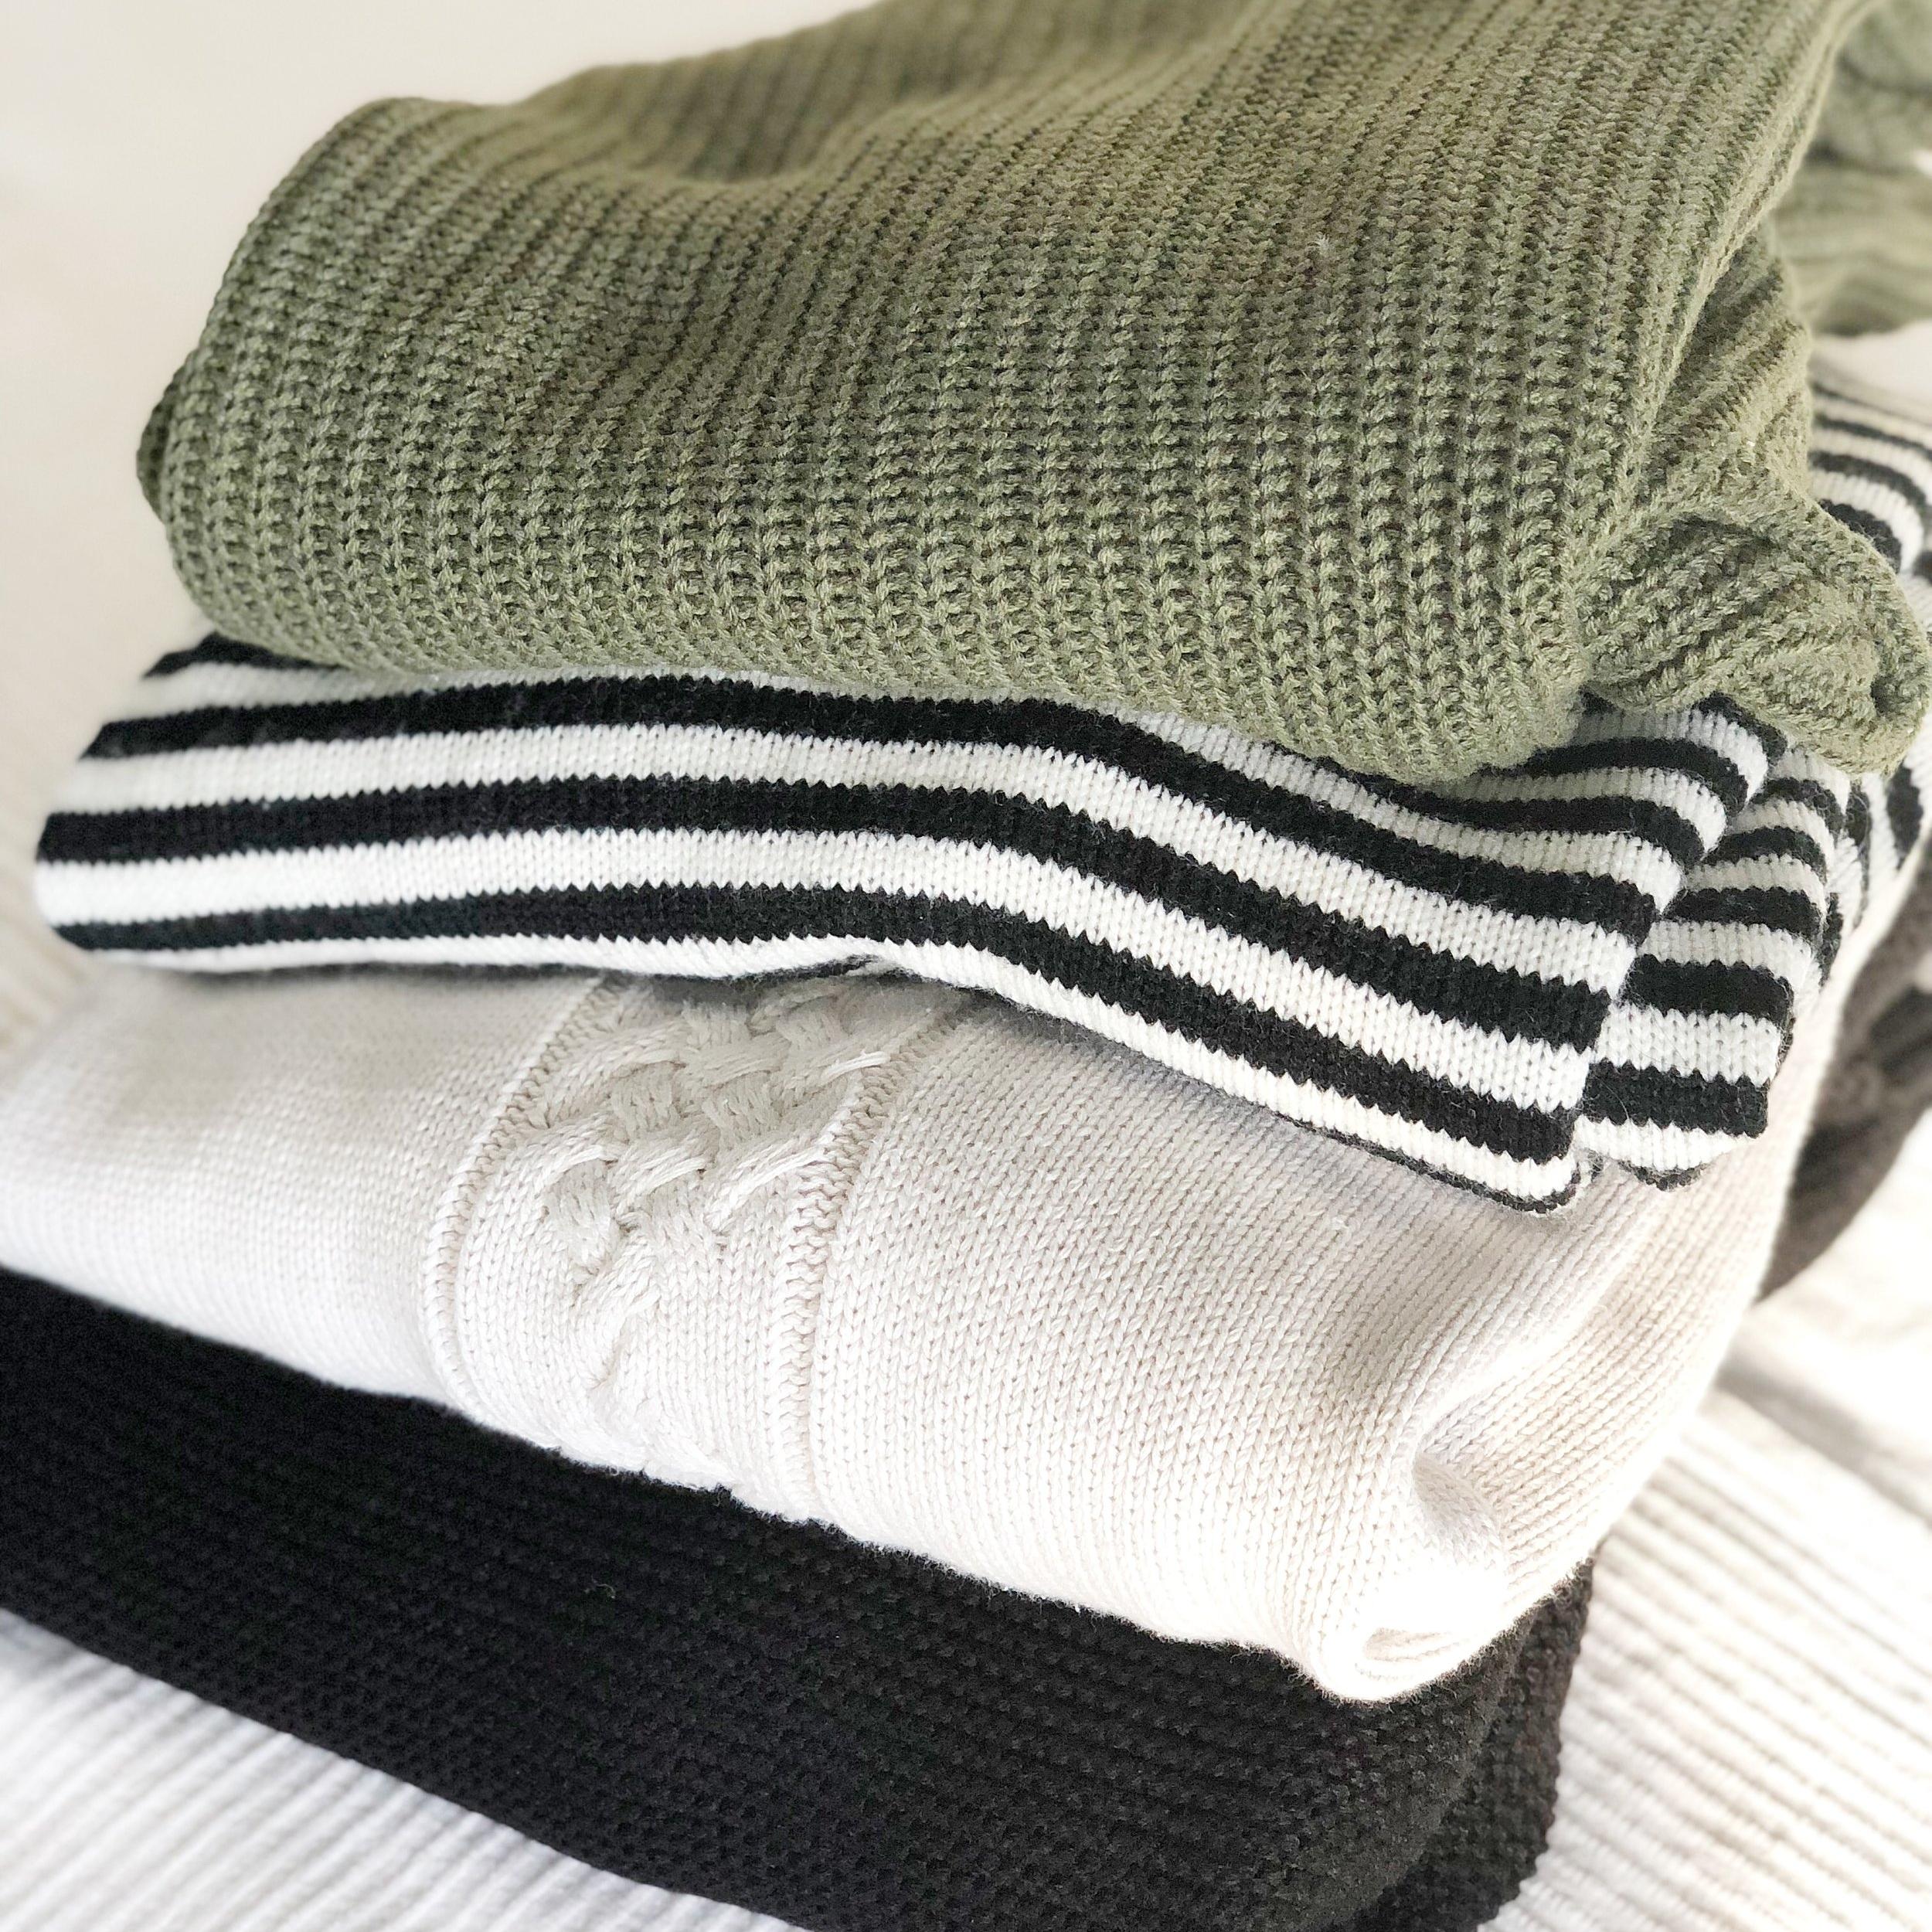 3.Knit sweaters -